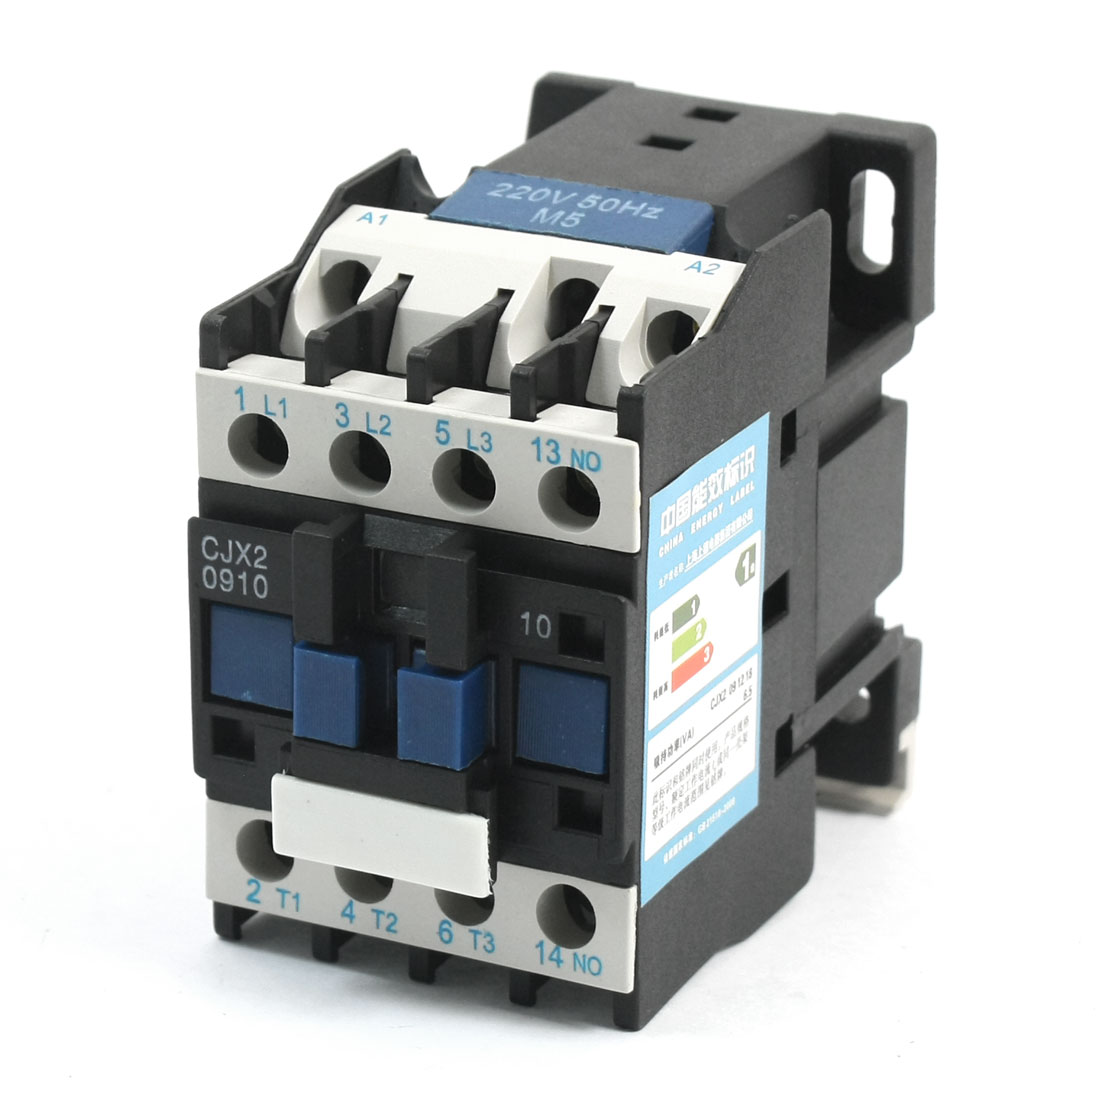 50HZ 220V Coil 20A Motor Control NO Contact AC Contactor CJX2-0910